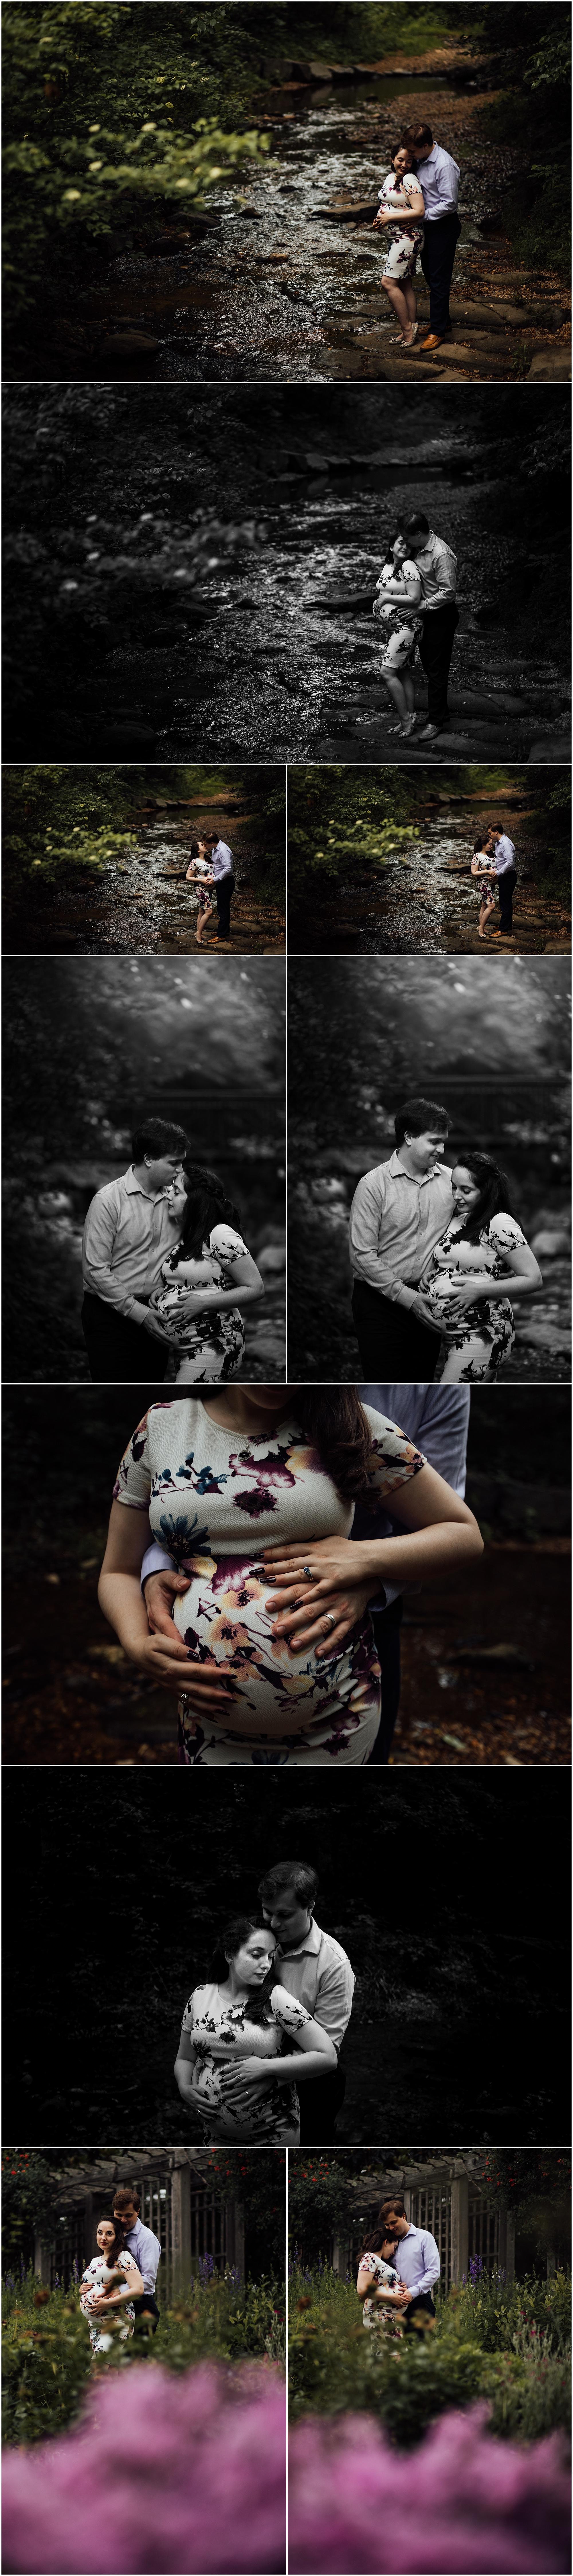 Creek maternity session by Huntsville Alabama maternity photographer Rachel K Photo